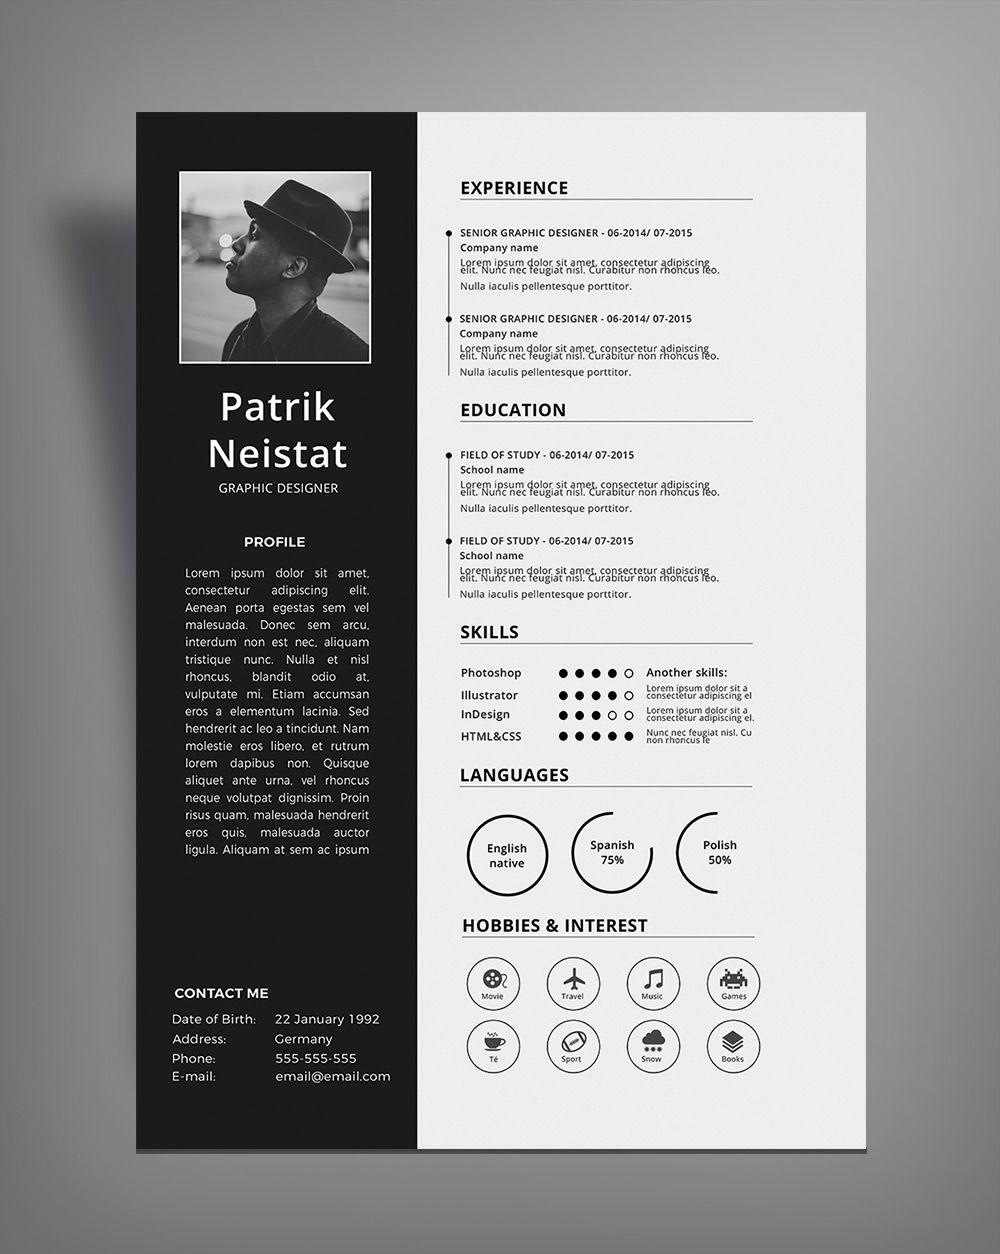 Simple Resume (CV) Desig8n Template Free PSD File (1) | Nature ...